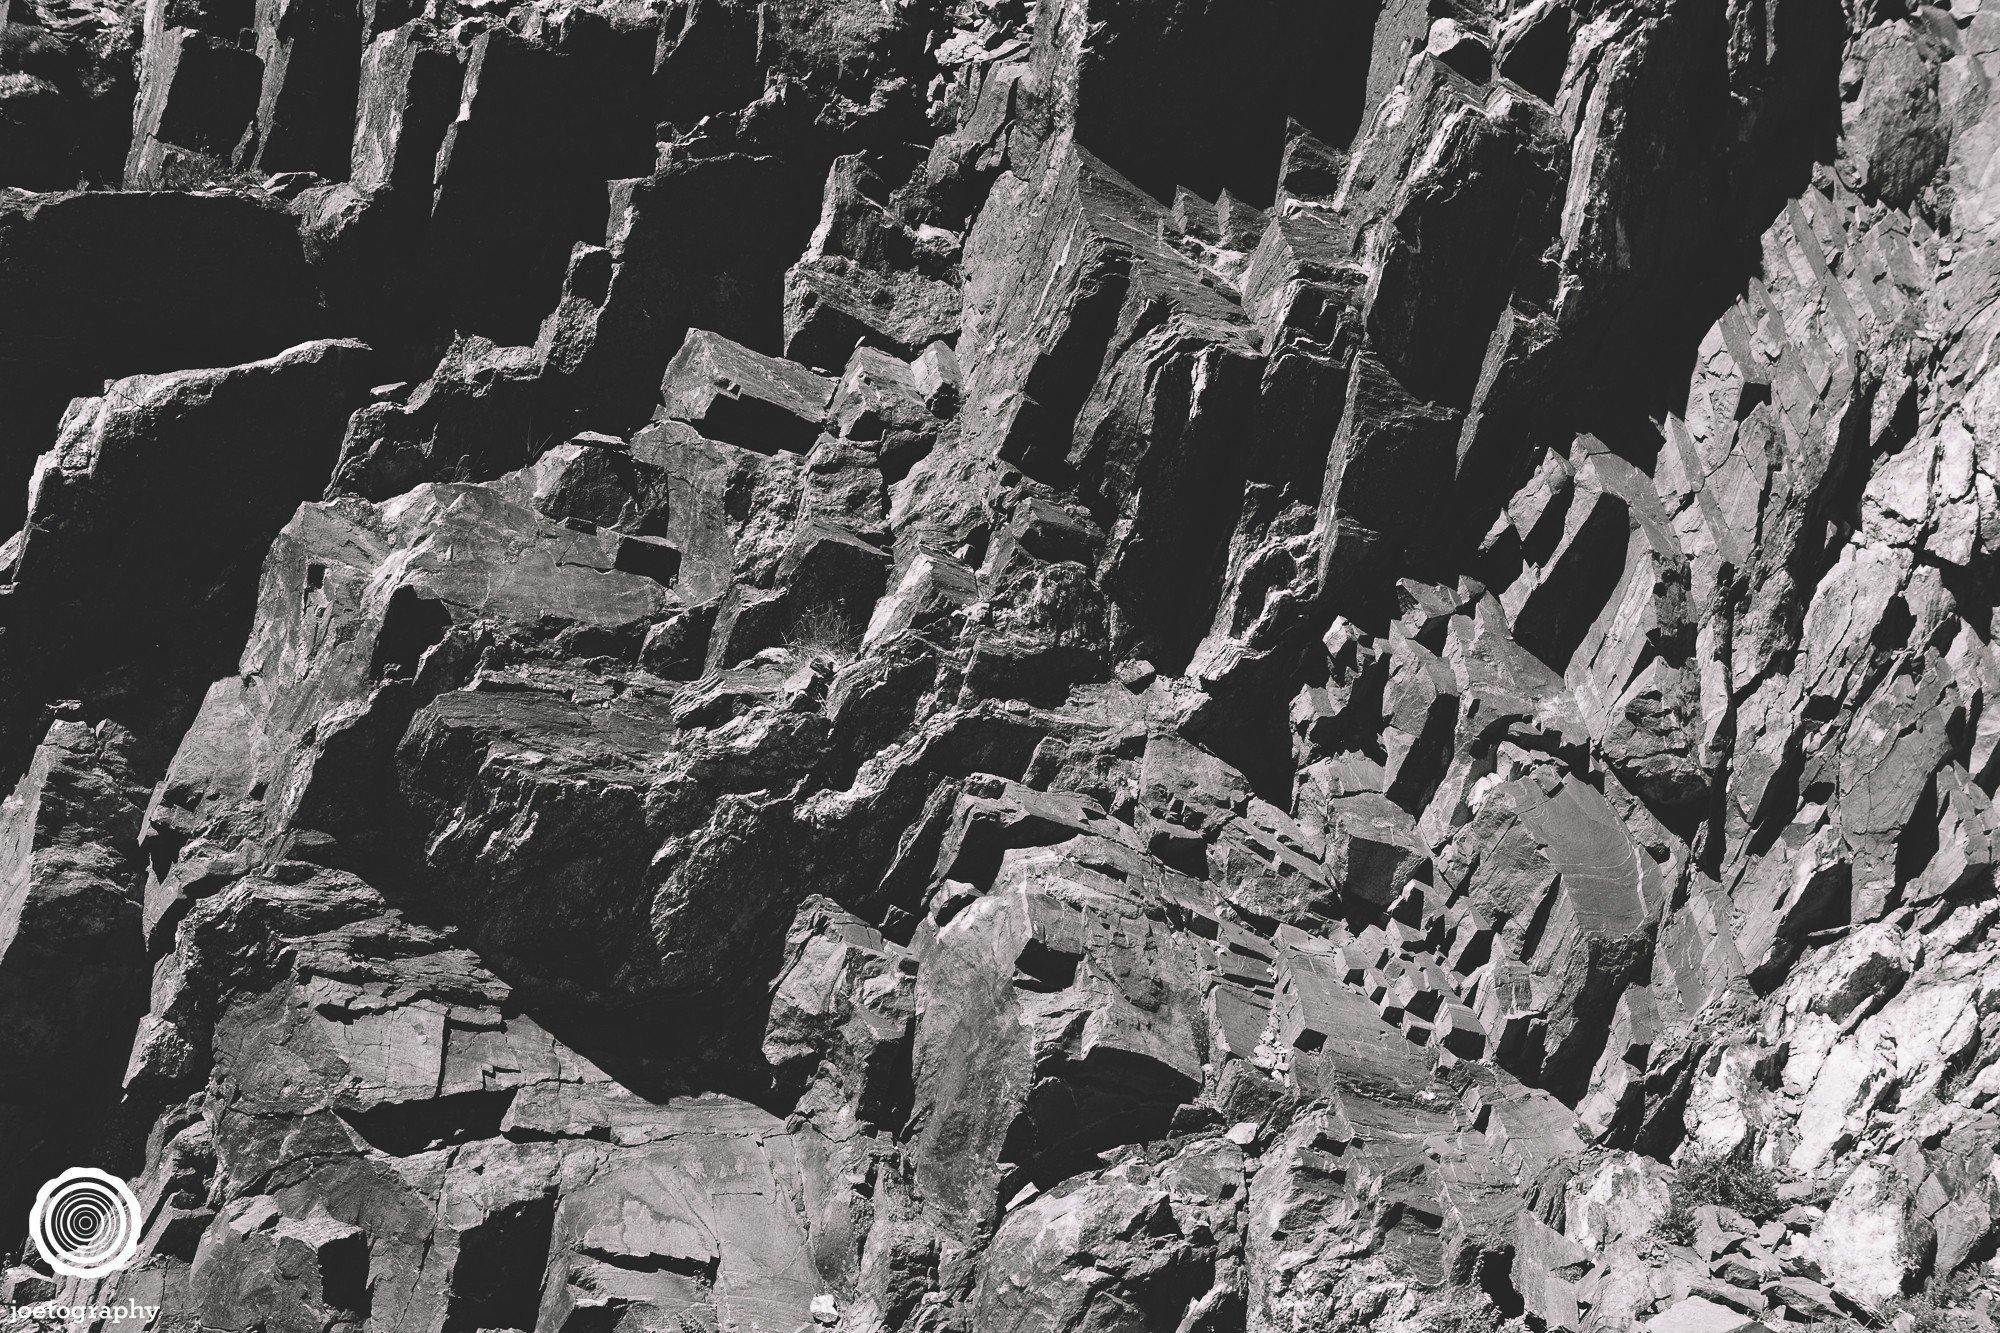 rocky-mountain-national-park-landscape-photographer-indianapolis-5